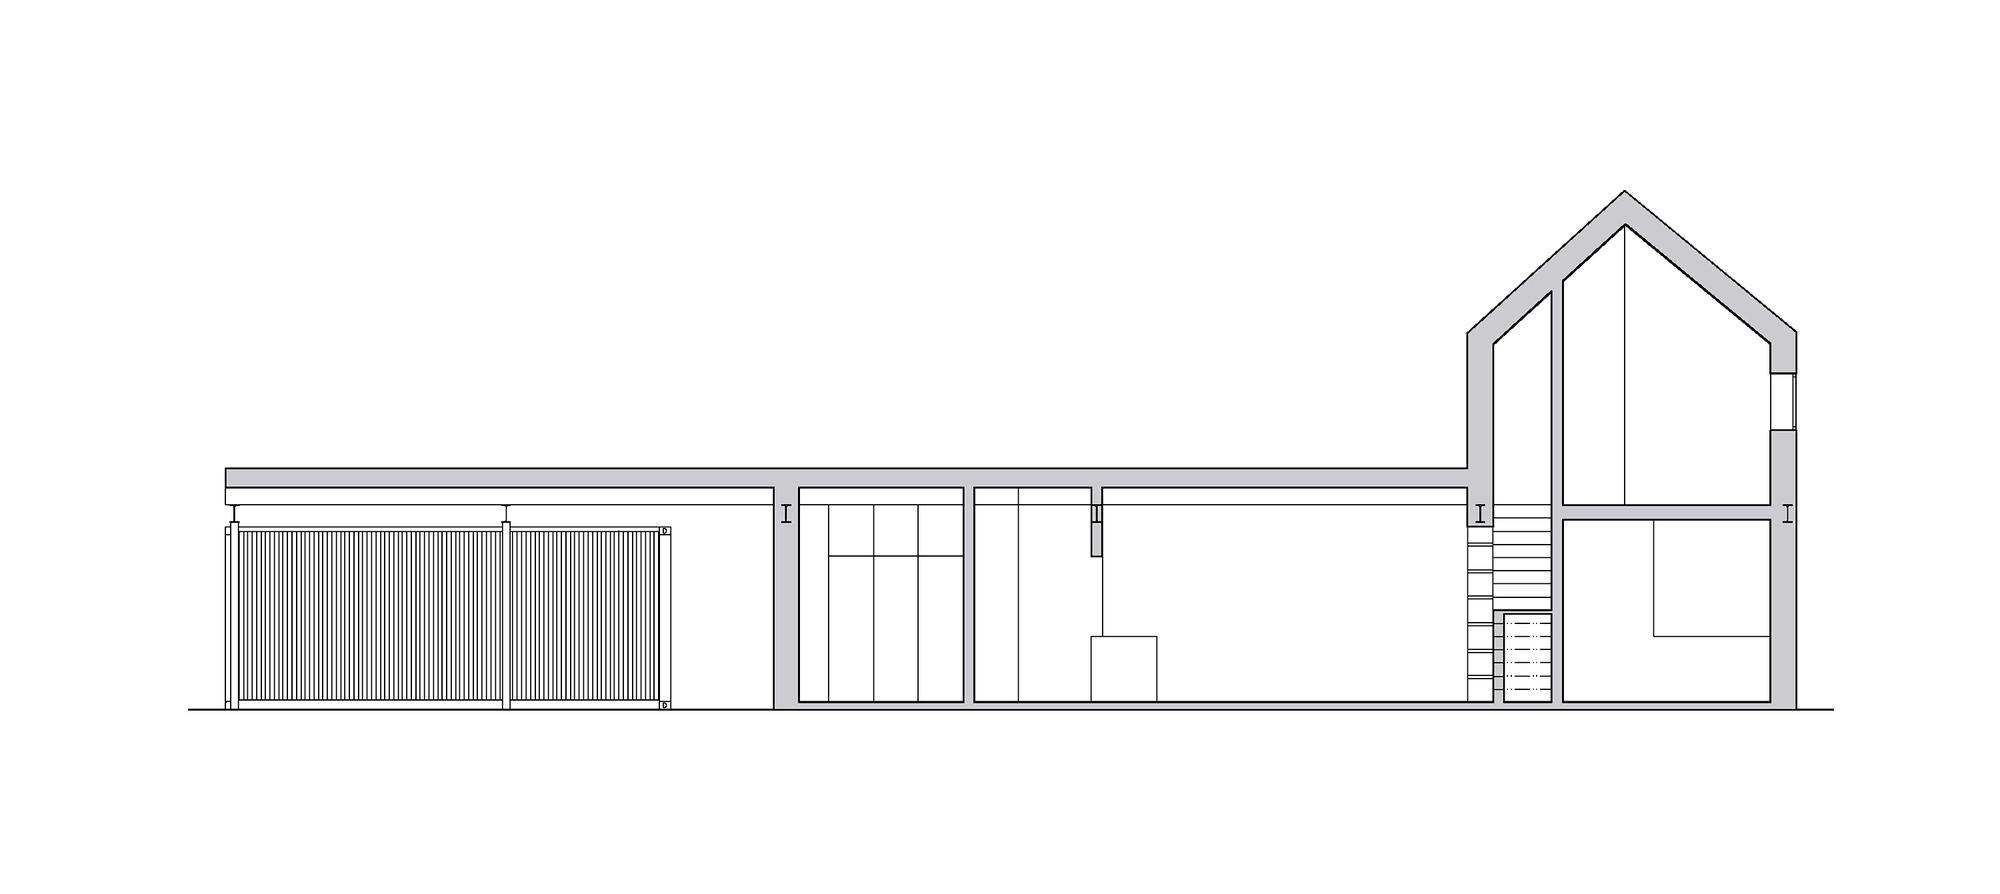 Galer A De La Casa Cercada Mj Lk Architekti 19